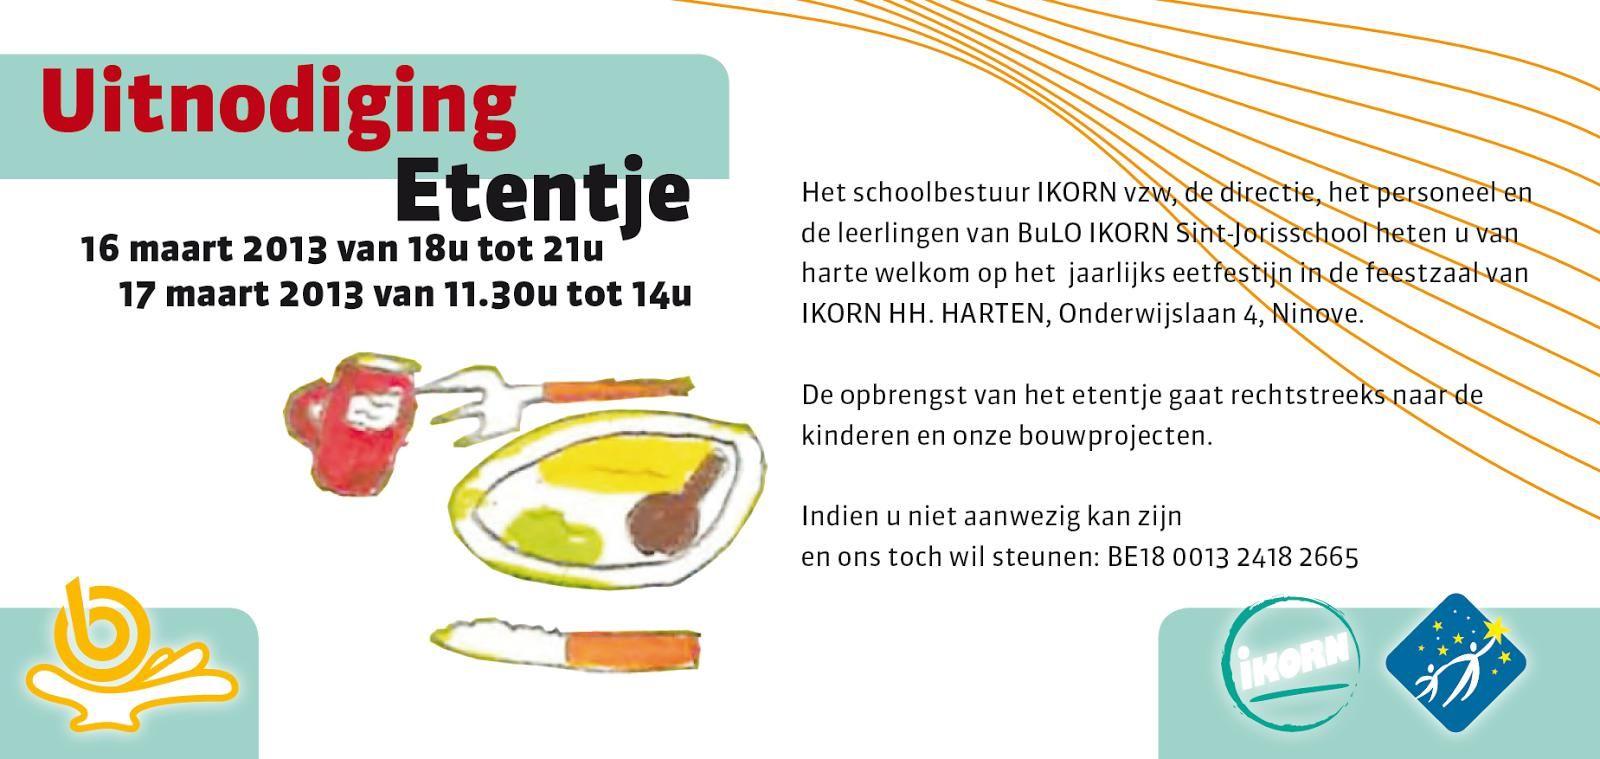 Populair Uitnodiging Etentje : Uitnodiging Etentje Collega's  HH74